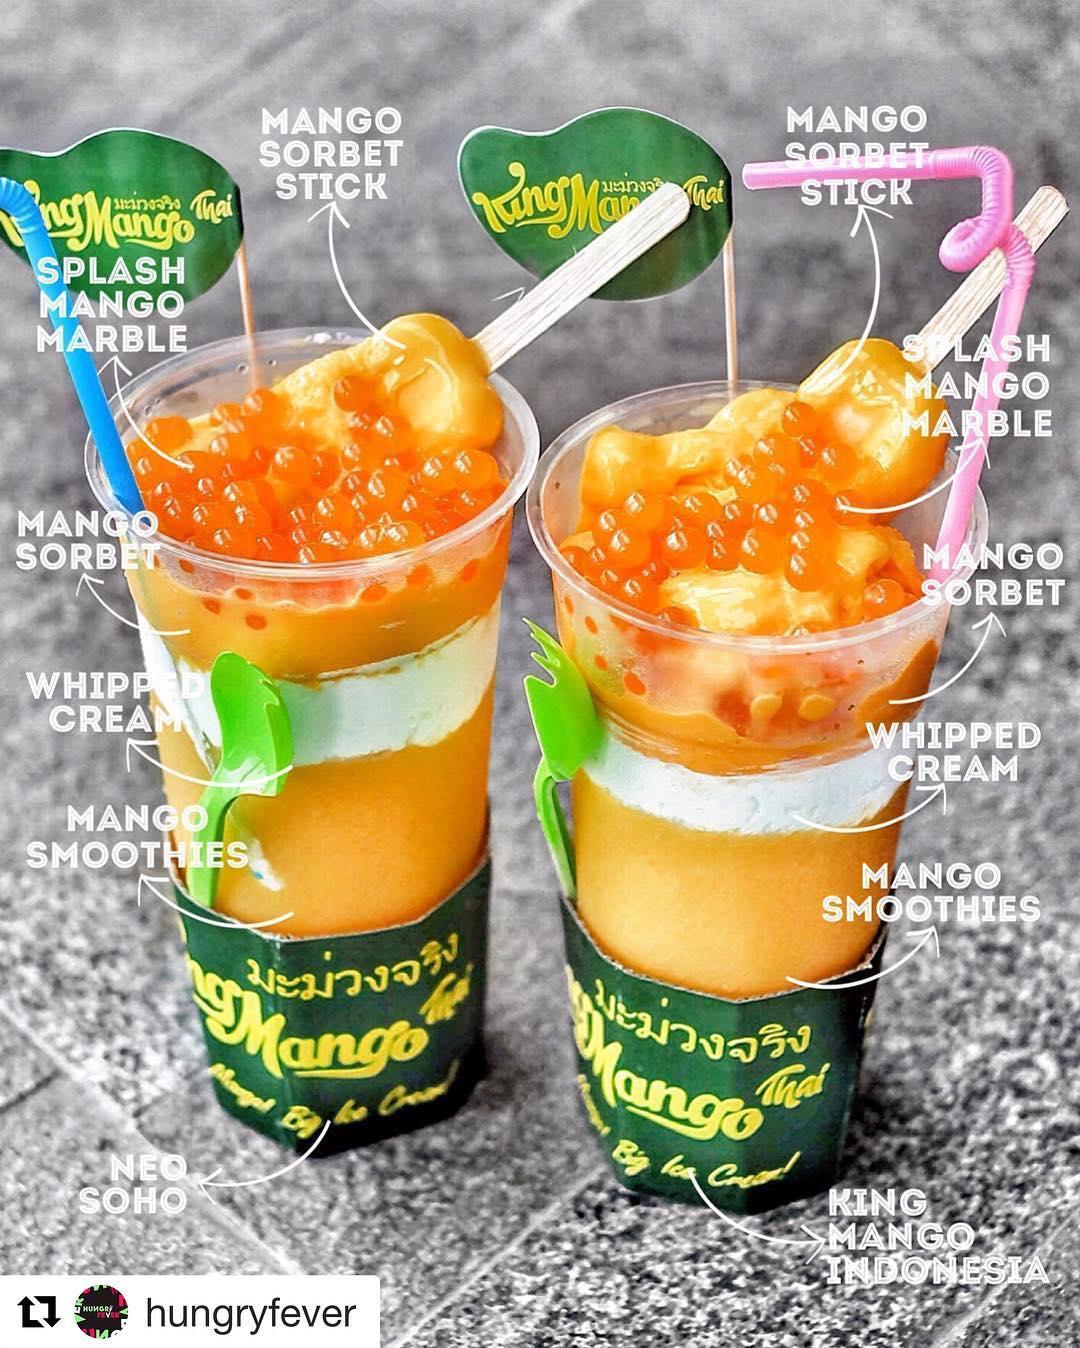 mango-splash-king-mango